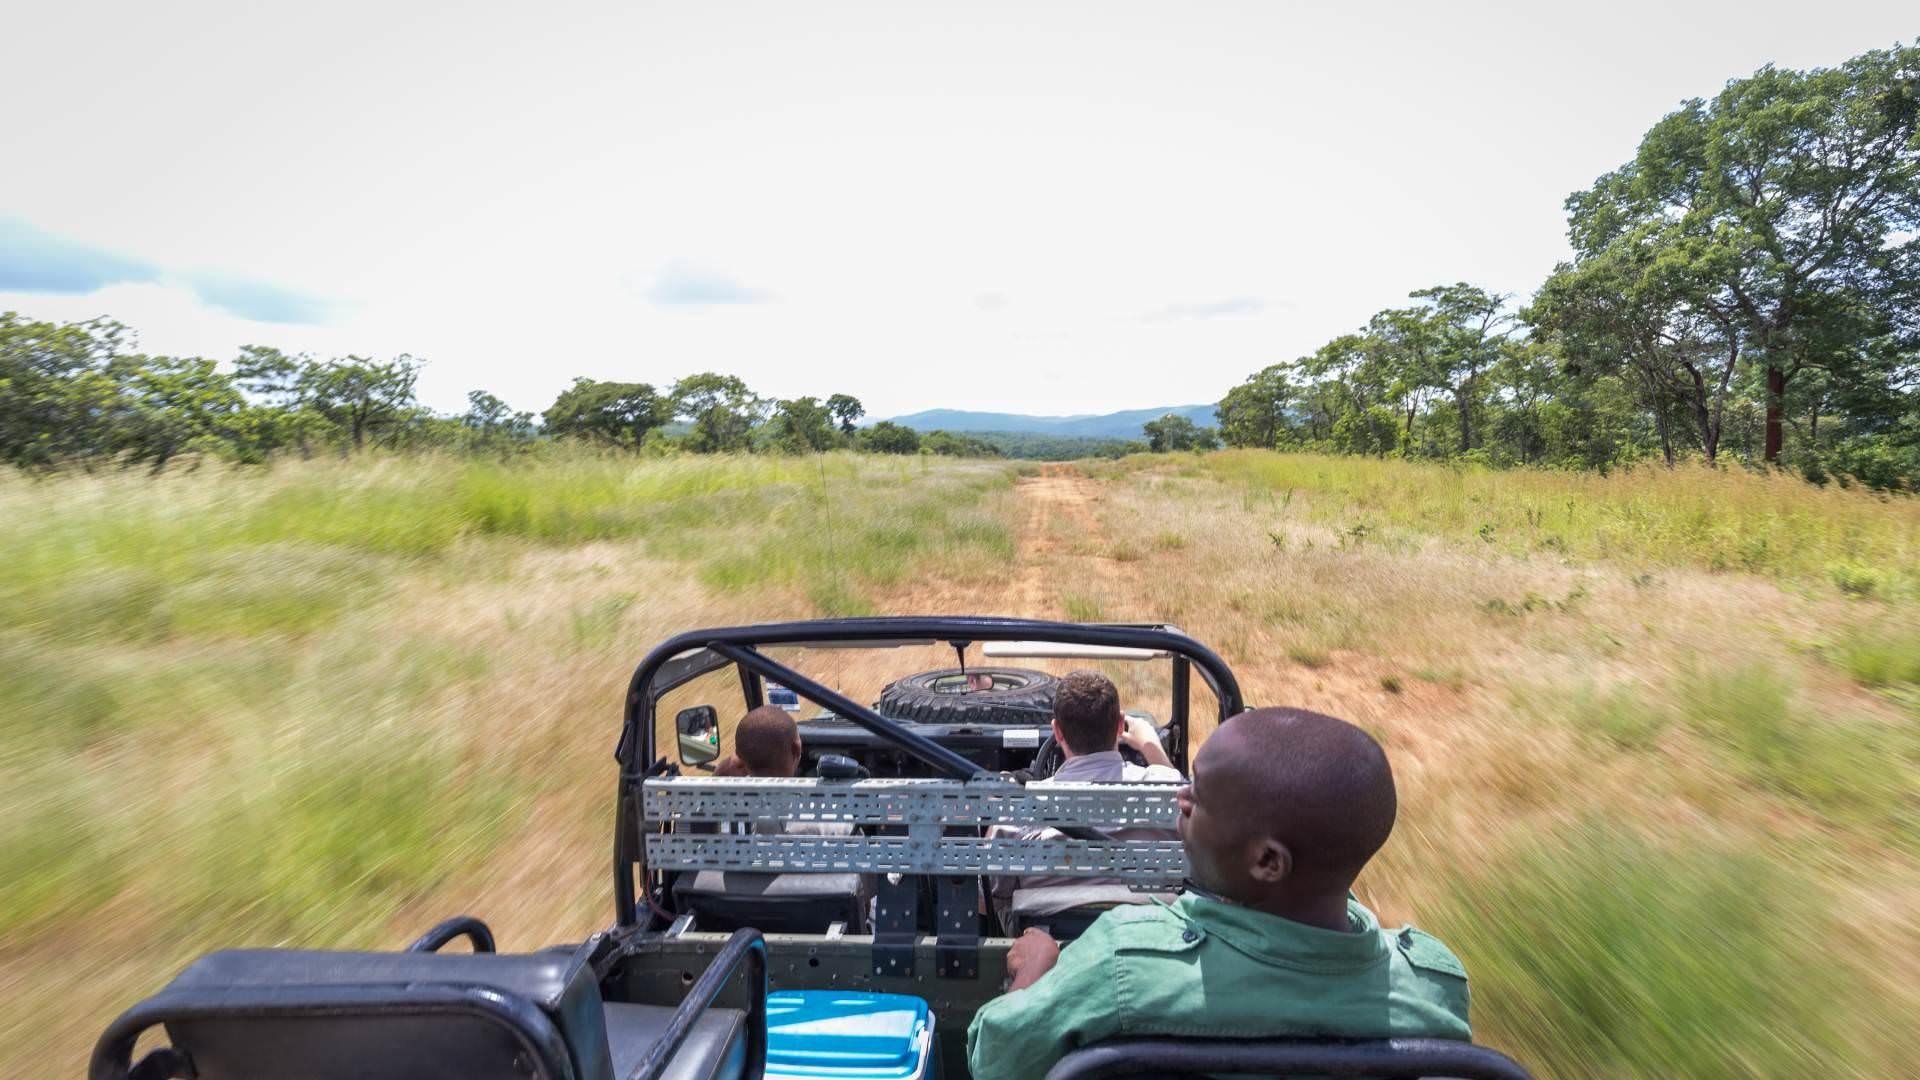 Tongole Wilderness Lodge, Nkhotakota Wilderness Reserve, Malawi Mit Safari Experten   Pinto Africa